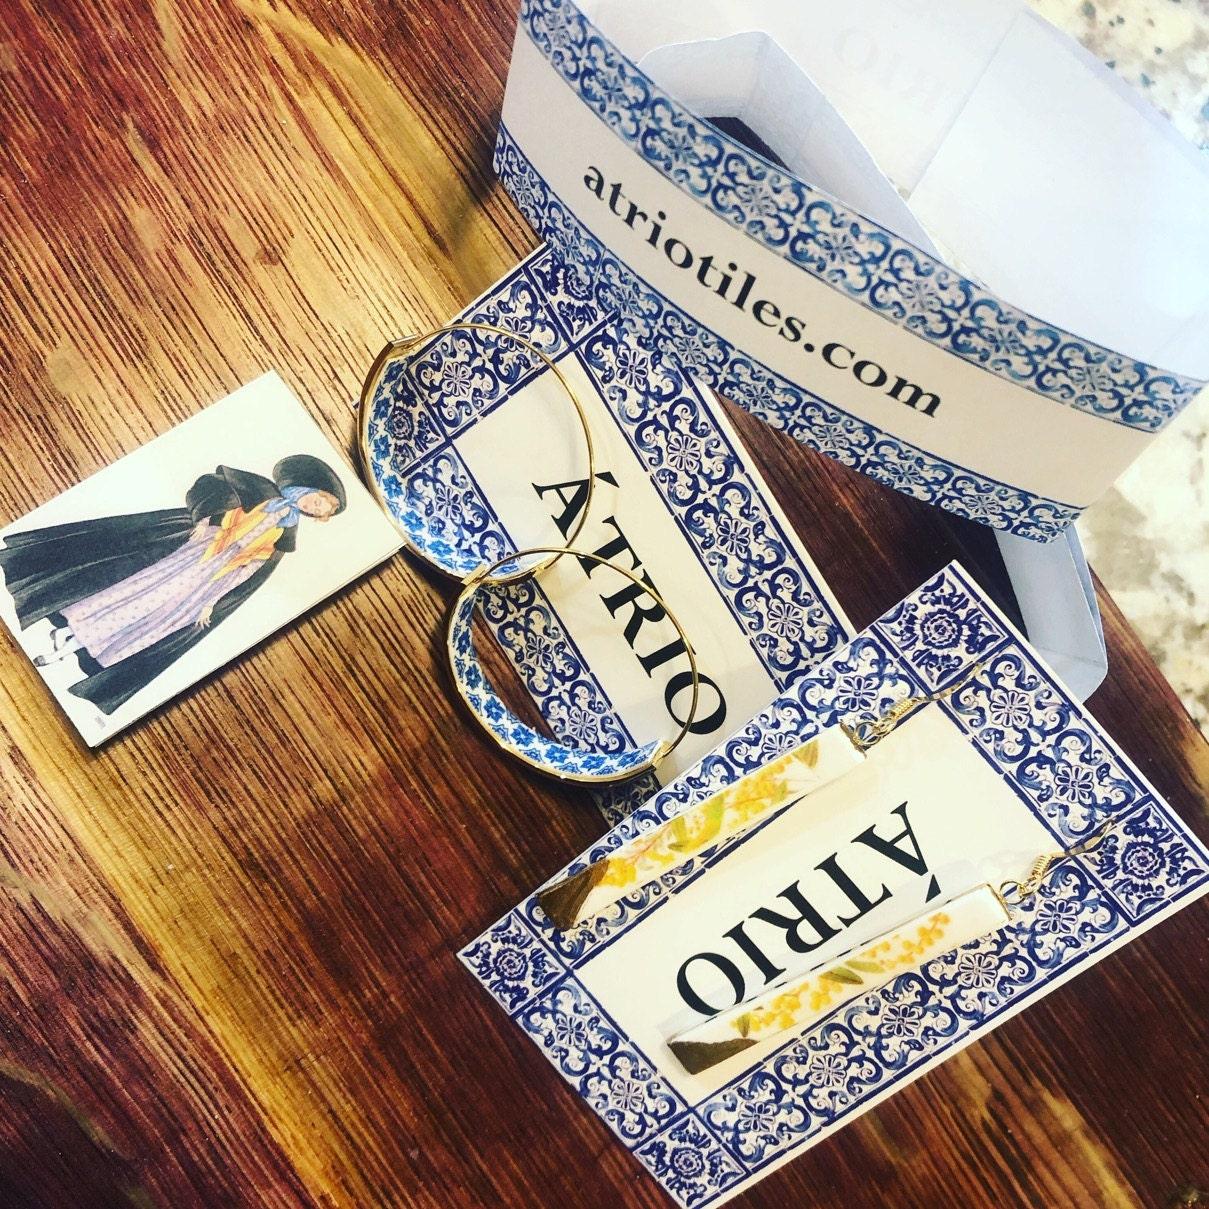 Elizabeth Sapata added a photo of their purchase